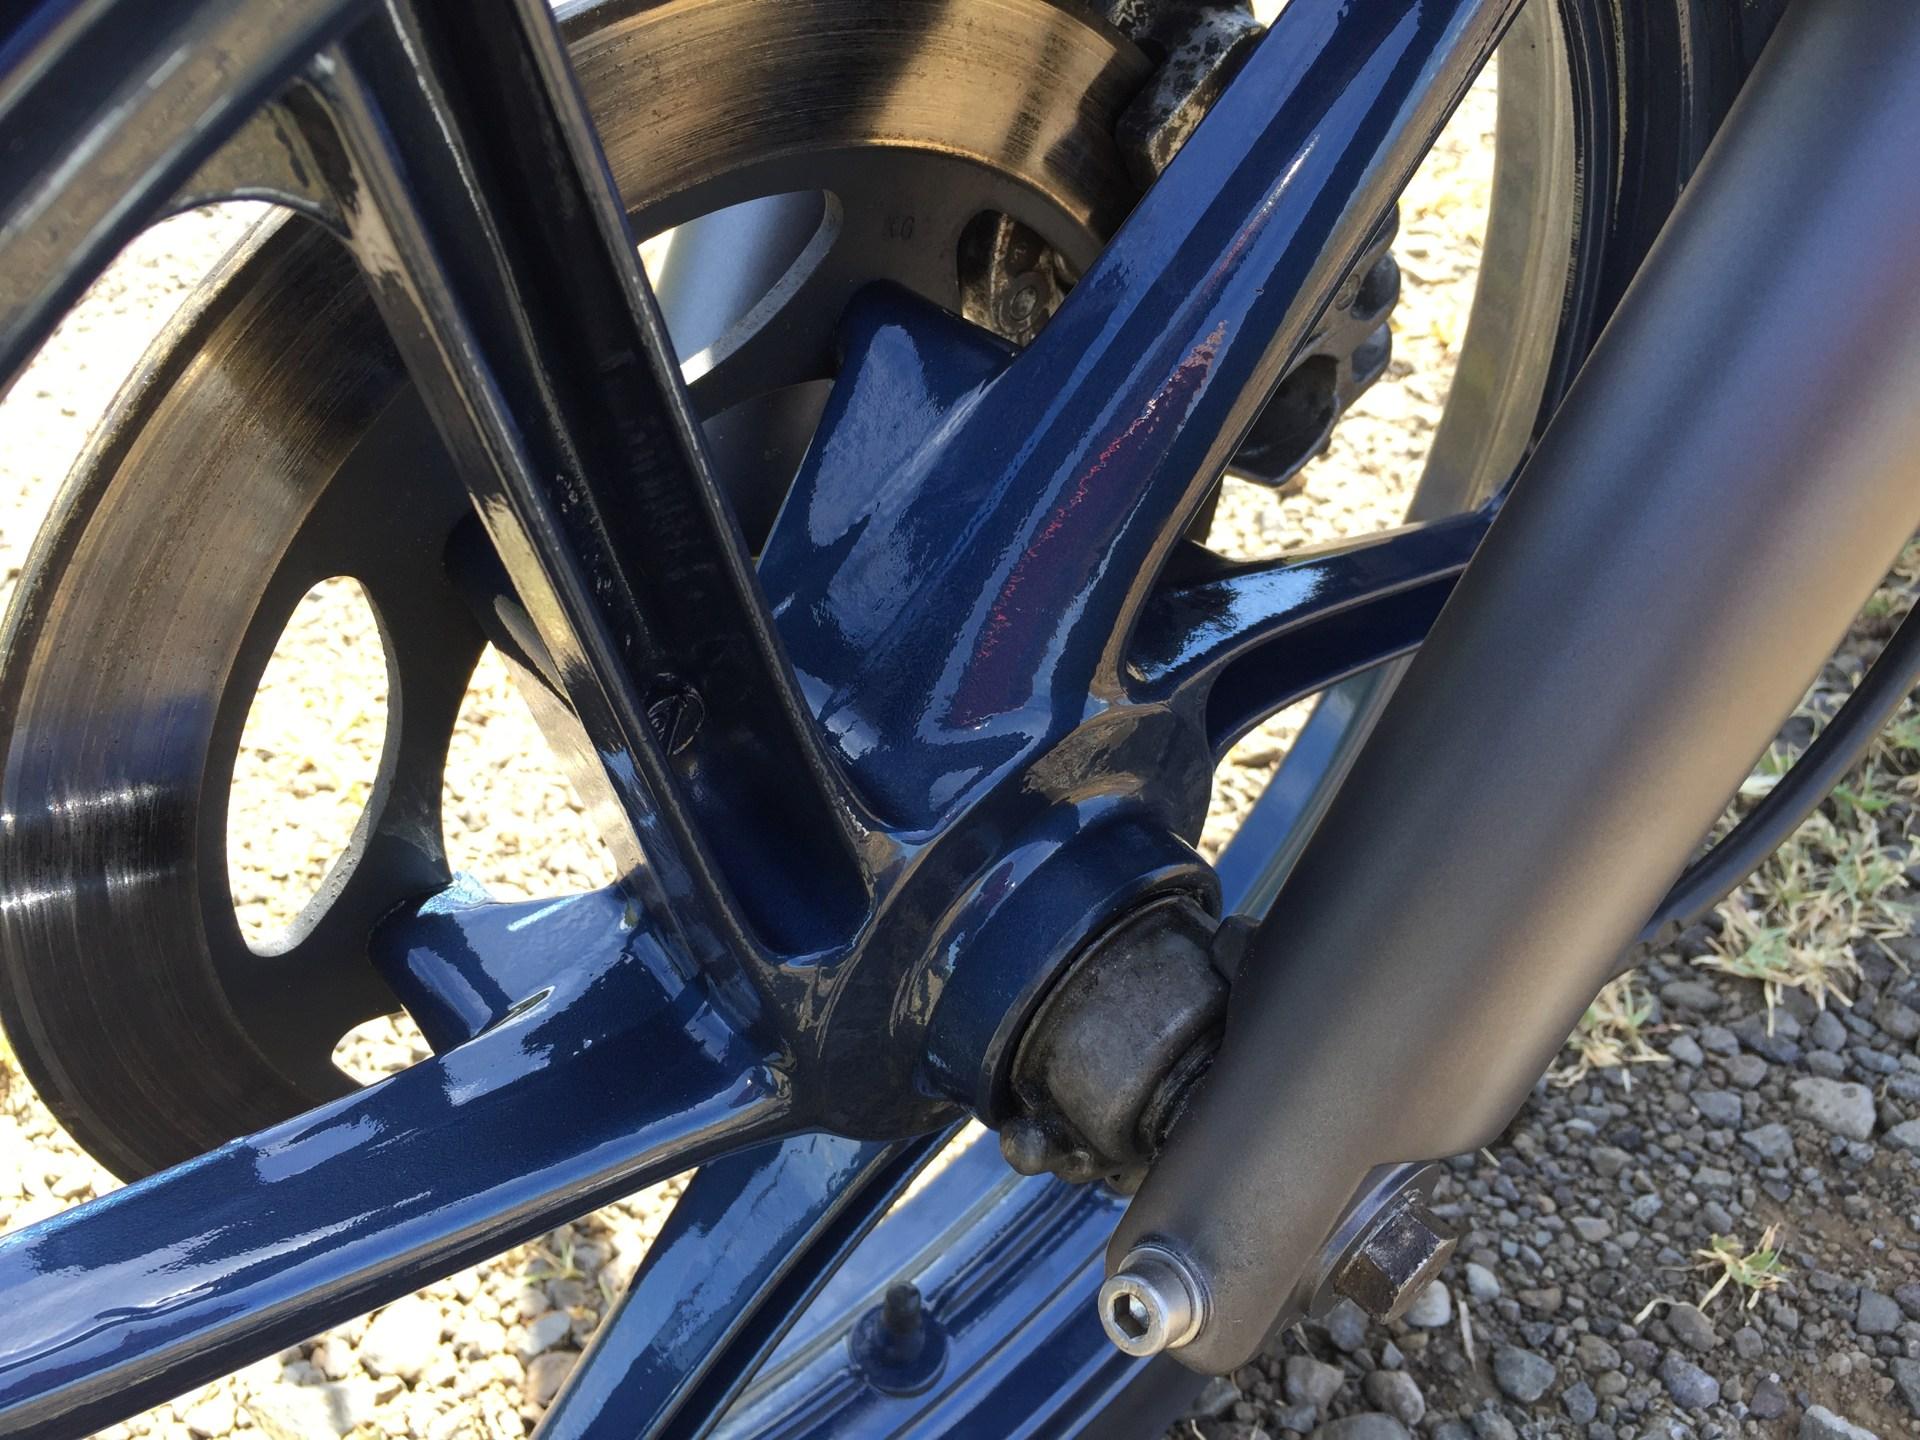 Honda cb 500 a2 by run iron works preparation transformation moto hérault aude